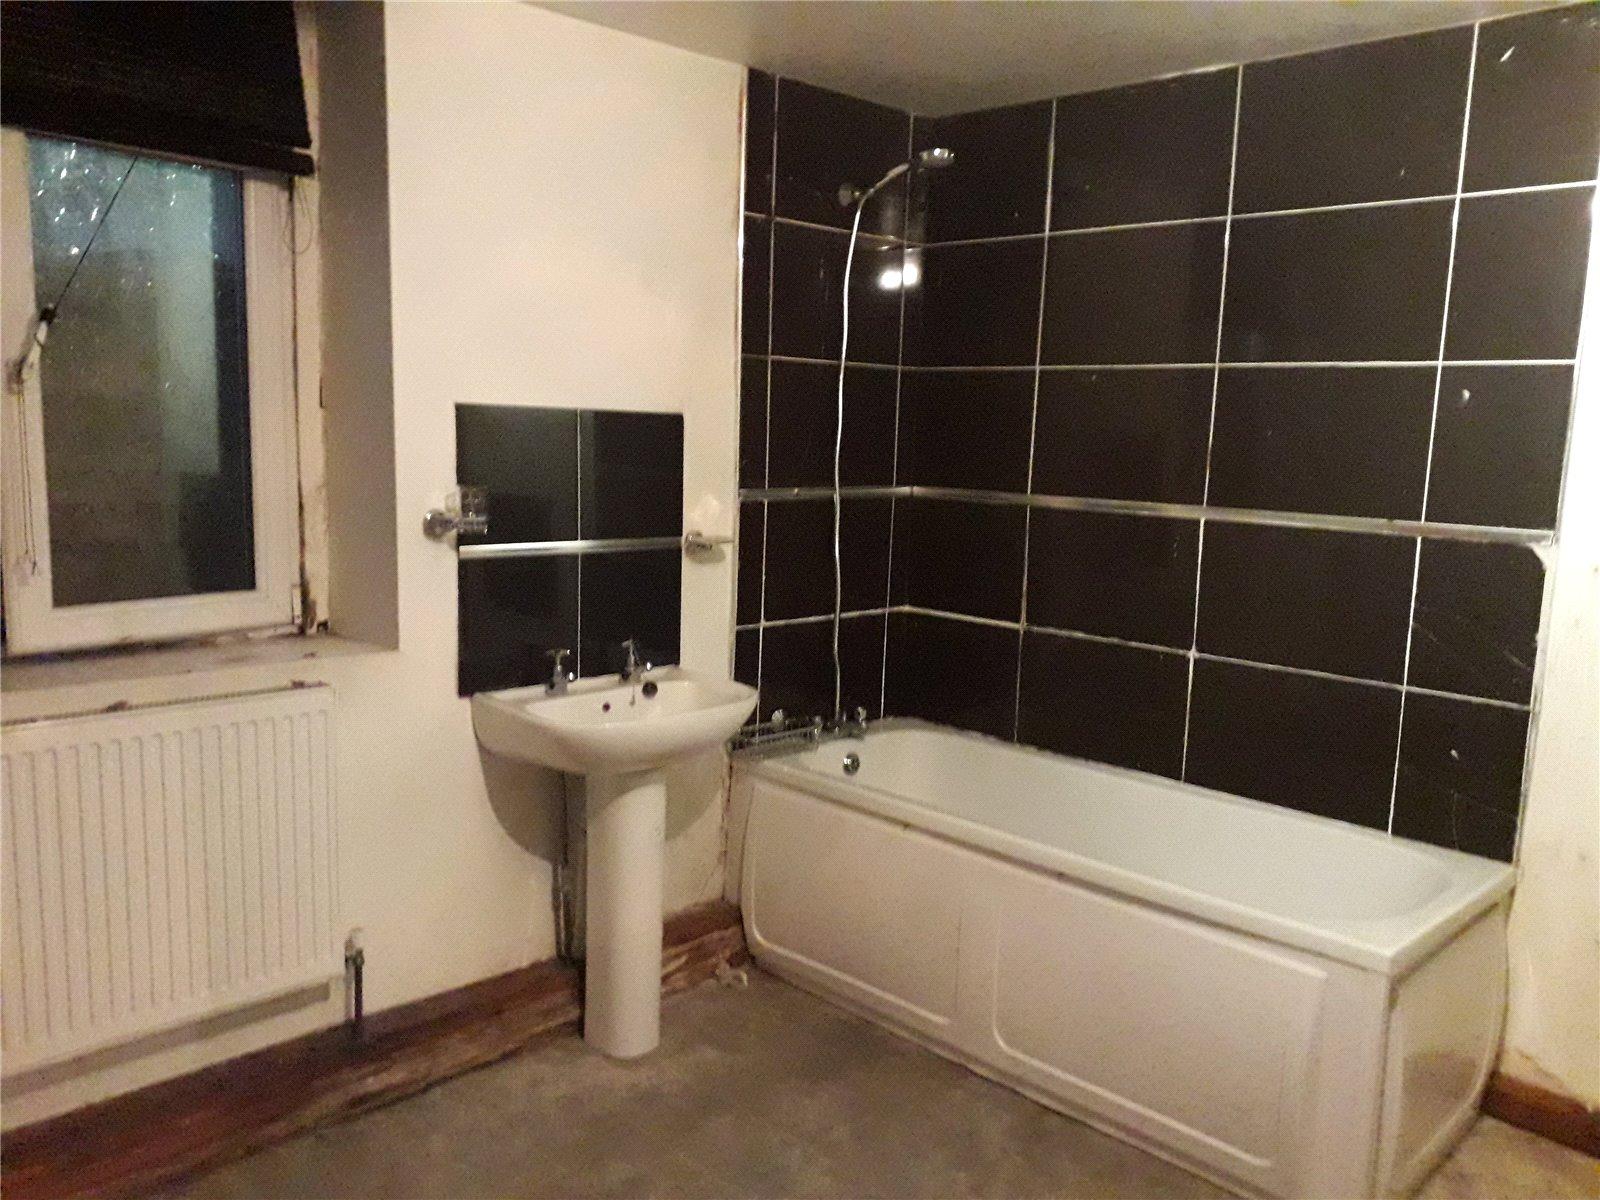 Lowerground Bathroom